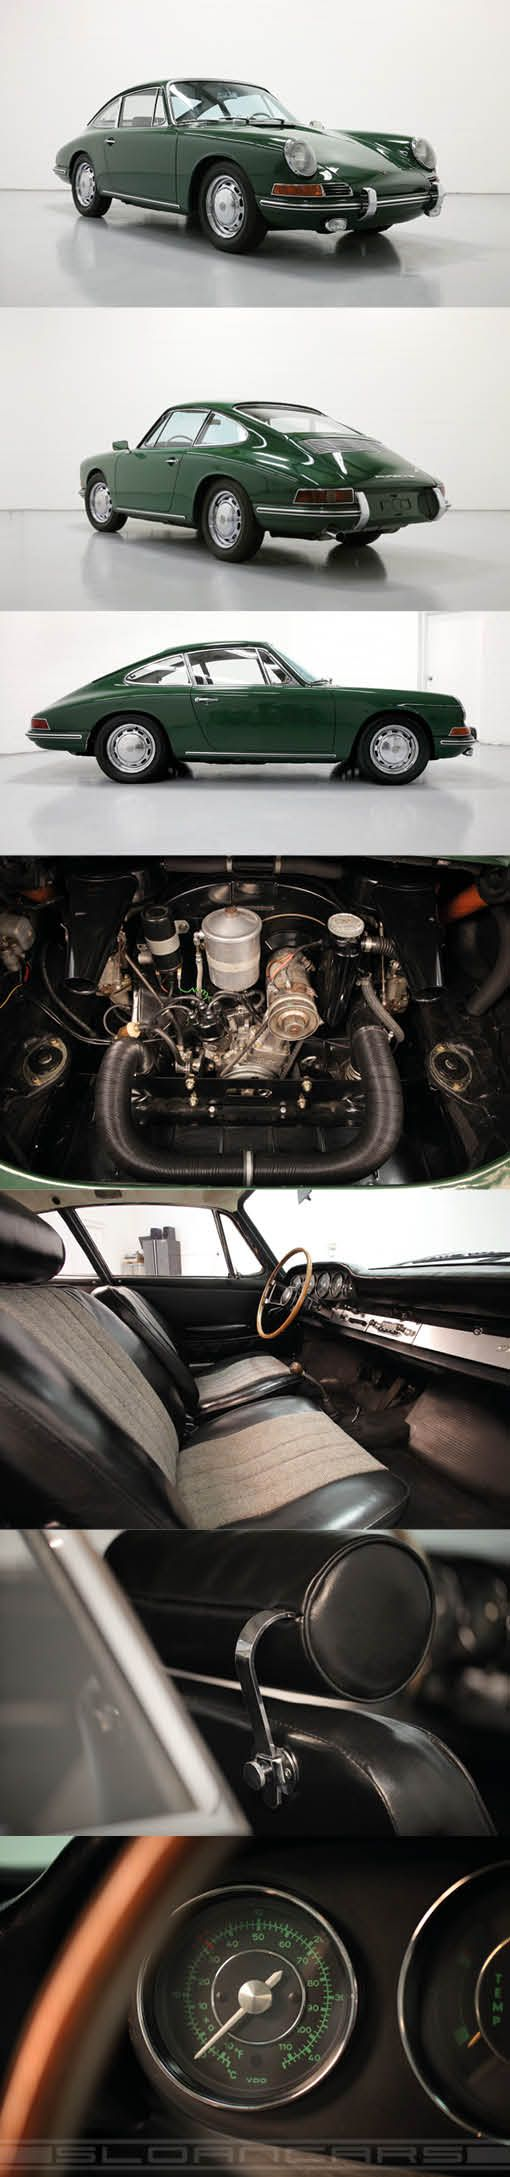 1966 Porsche 912 / Germany / Irish green